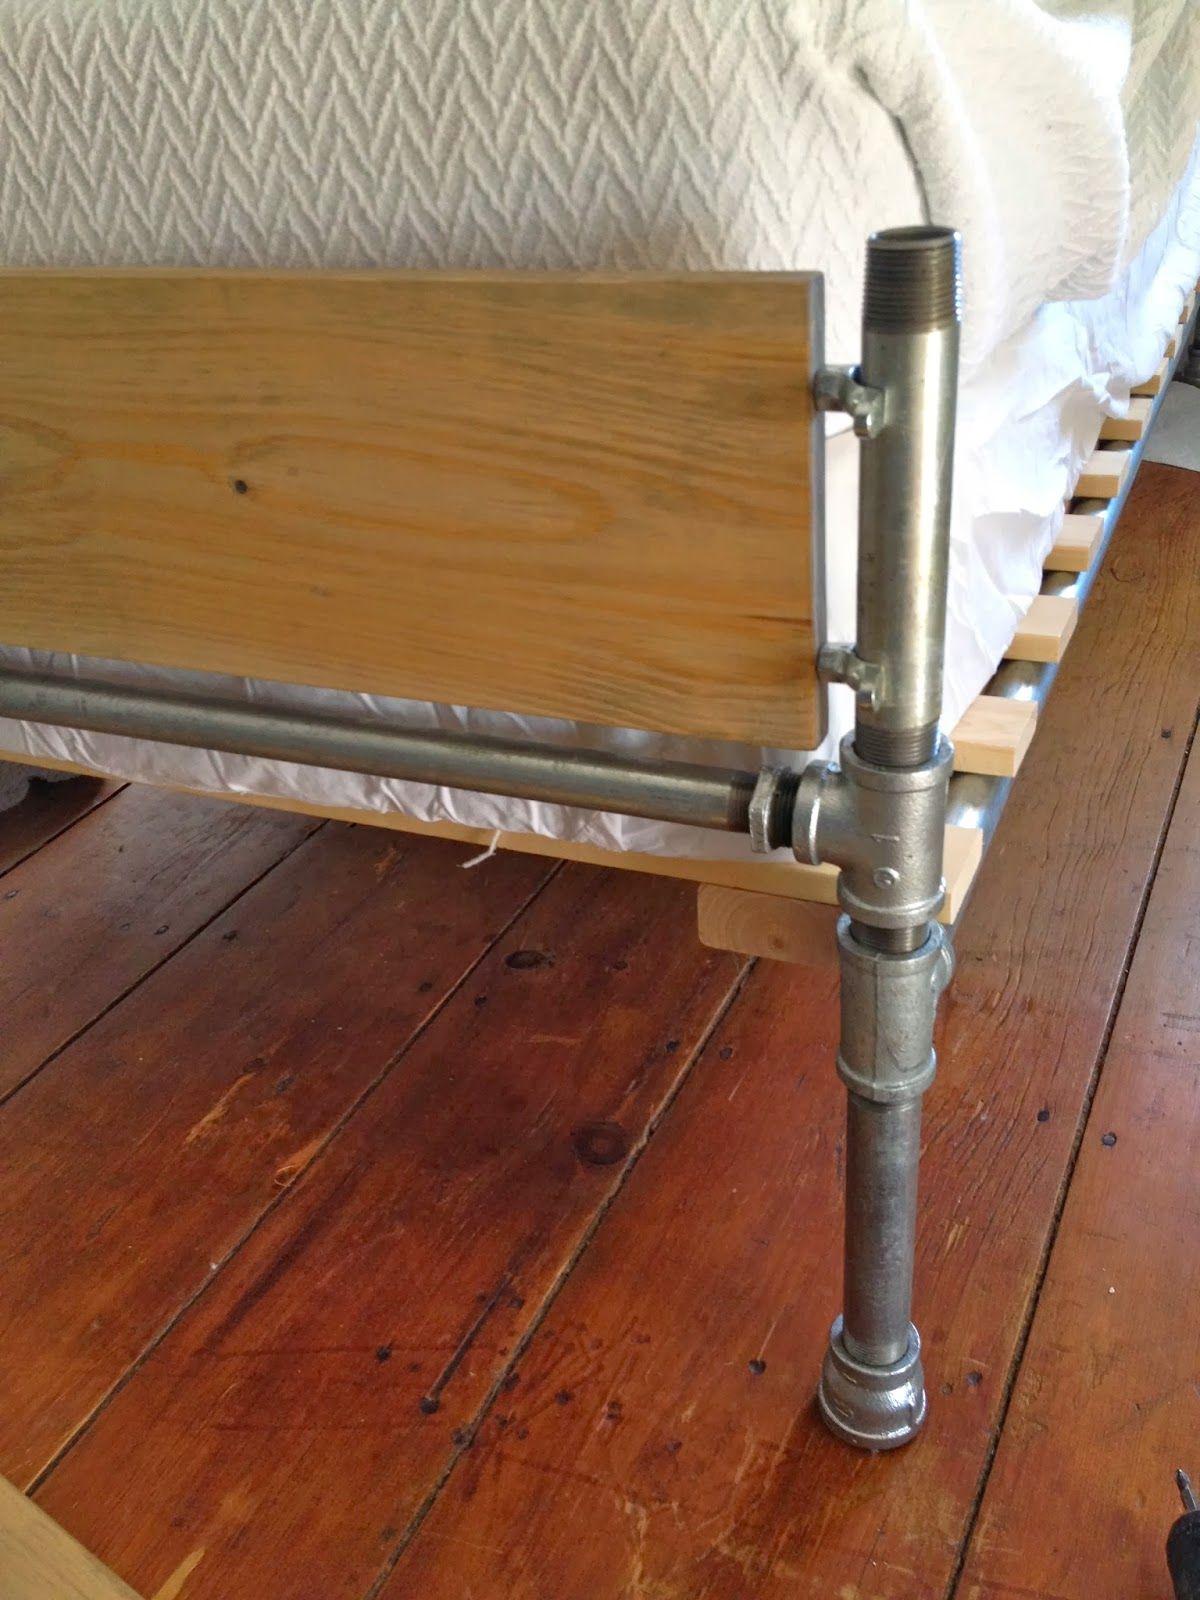 Diy Pipe Wood Slats Bed Bed Pipe Bed Bed Frame Bed